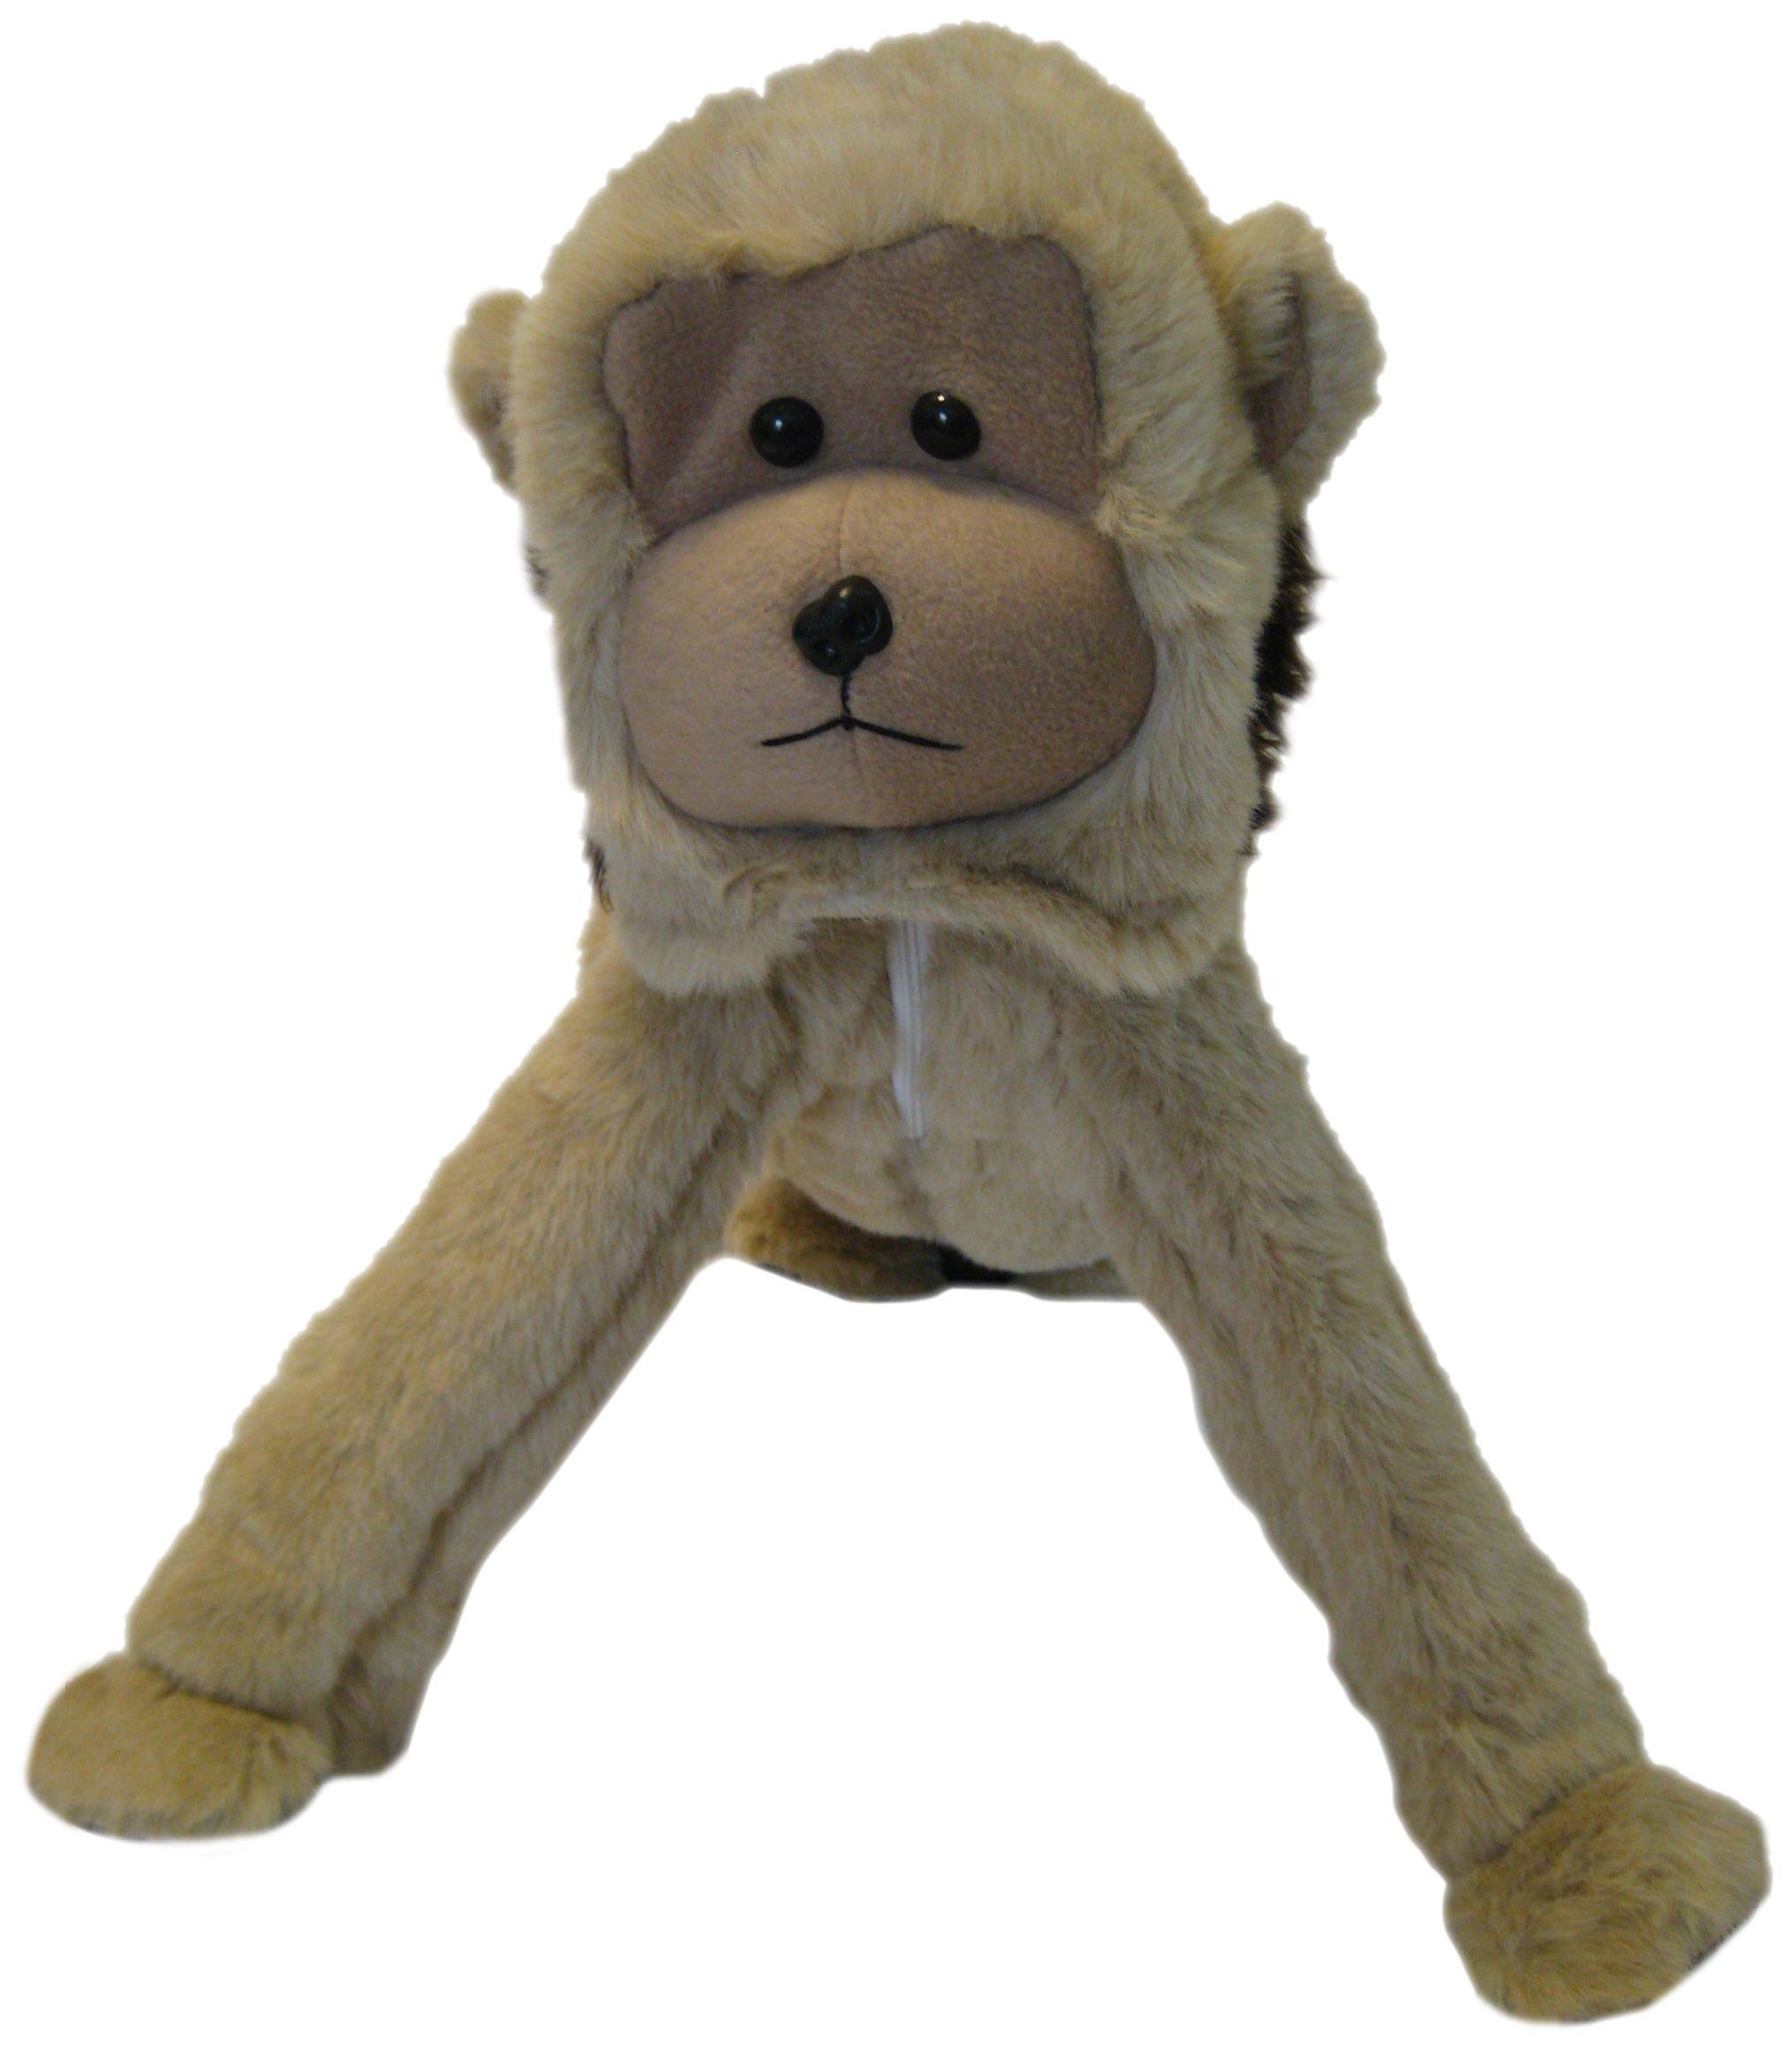 MiniZoo Golf Tan Monkey Bag Cover, Small